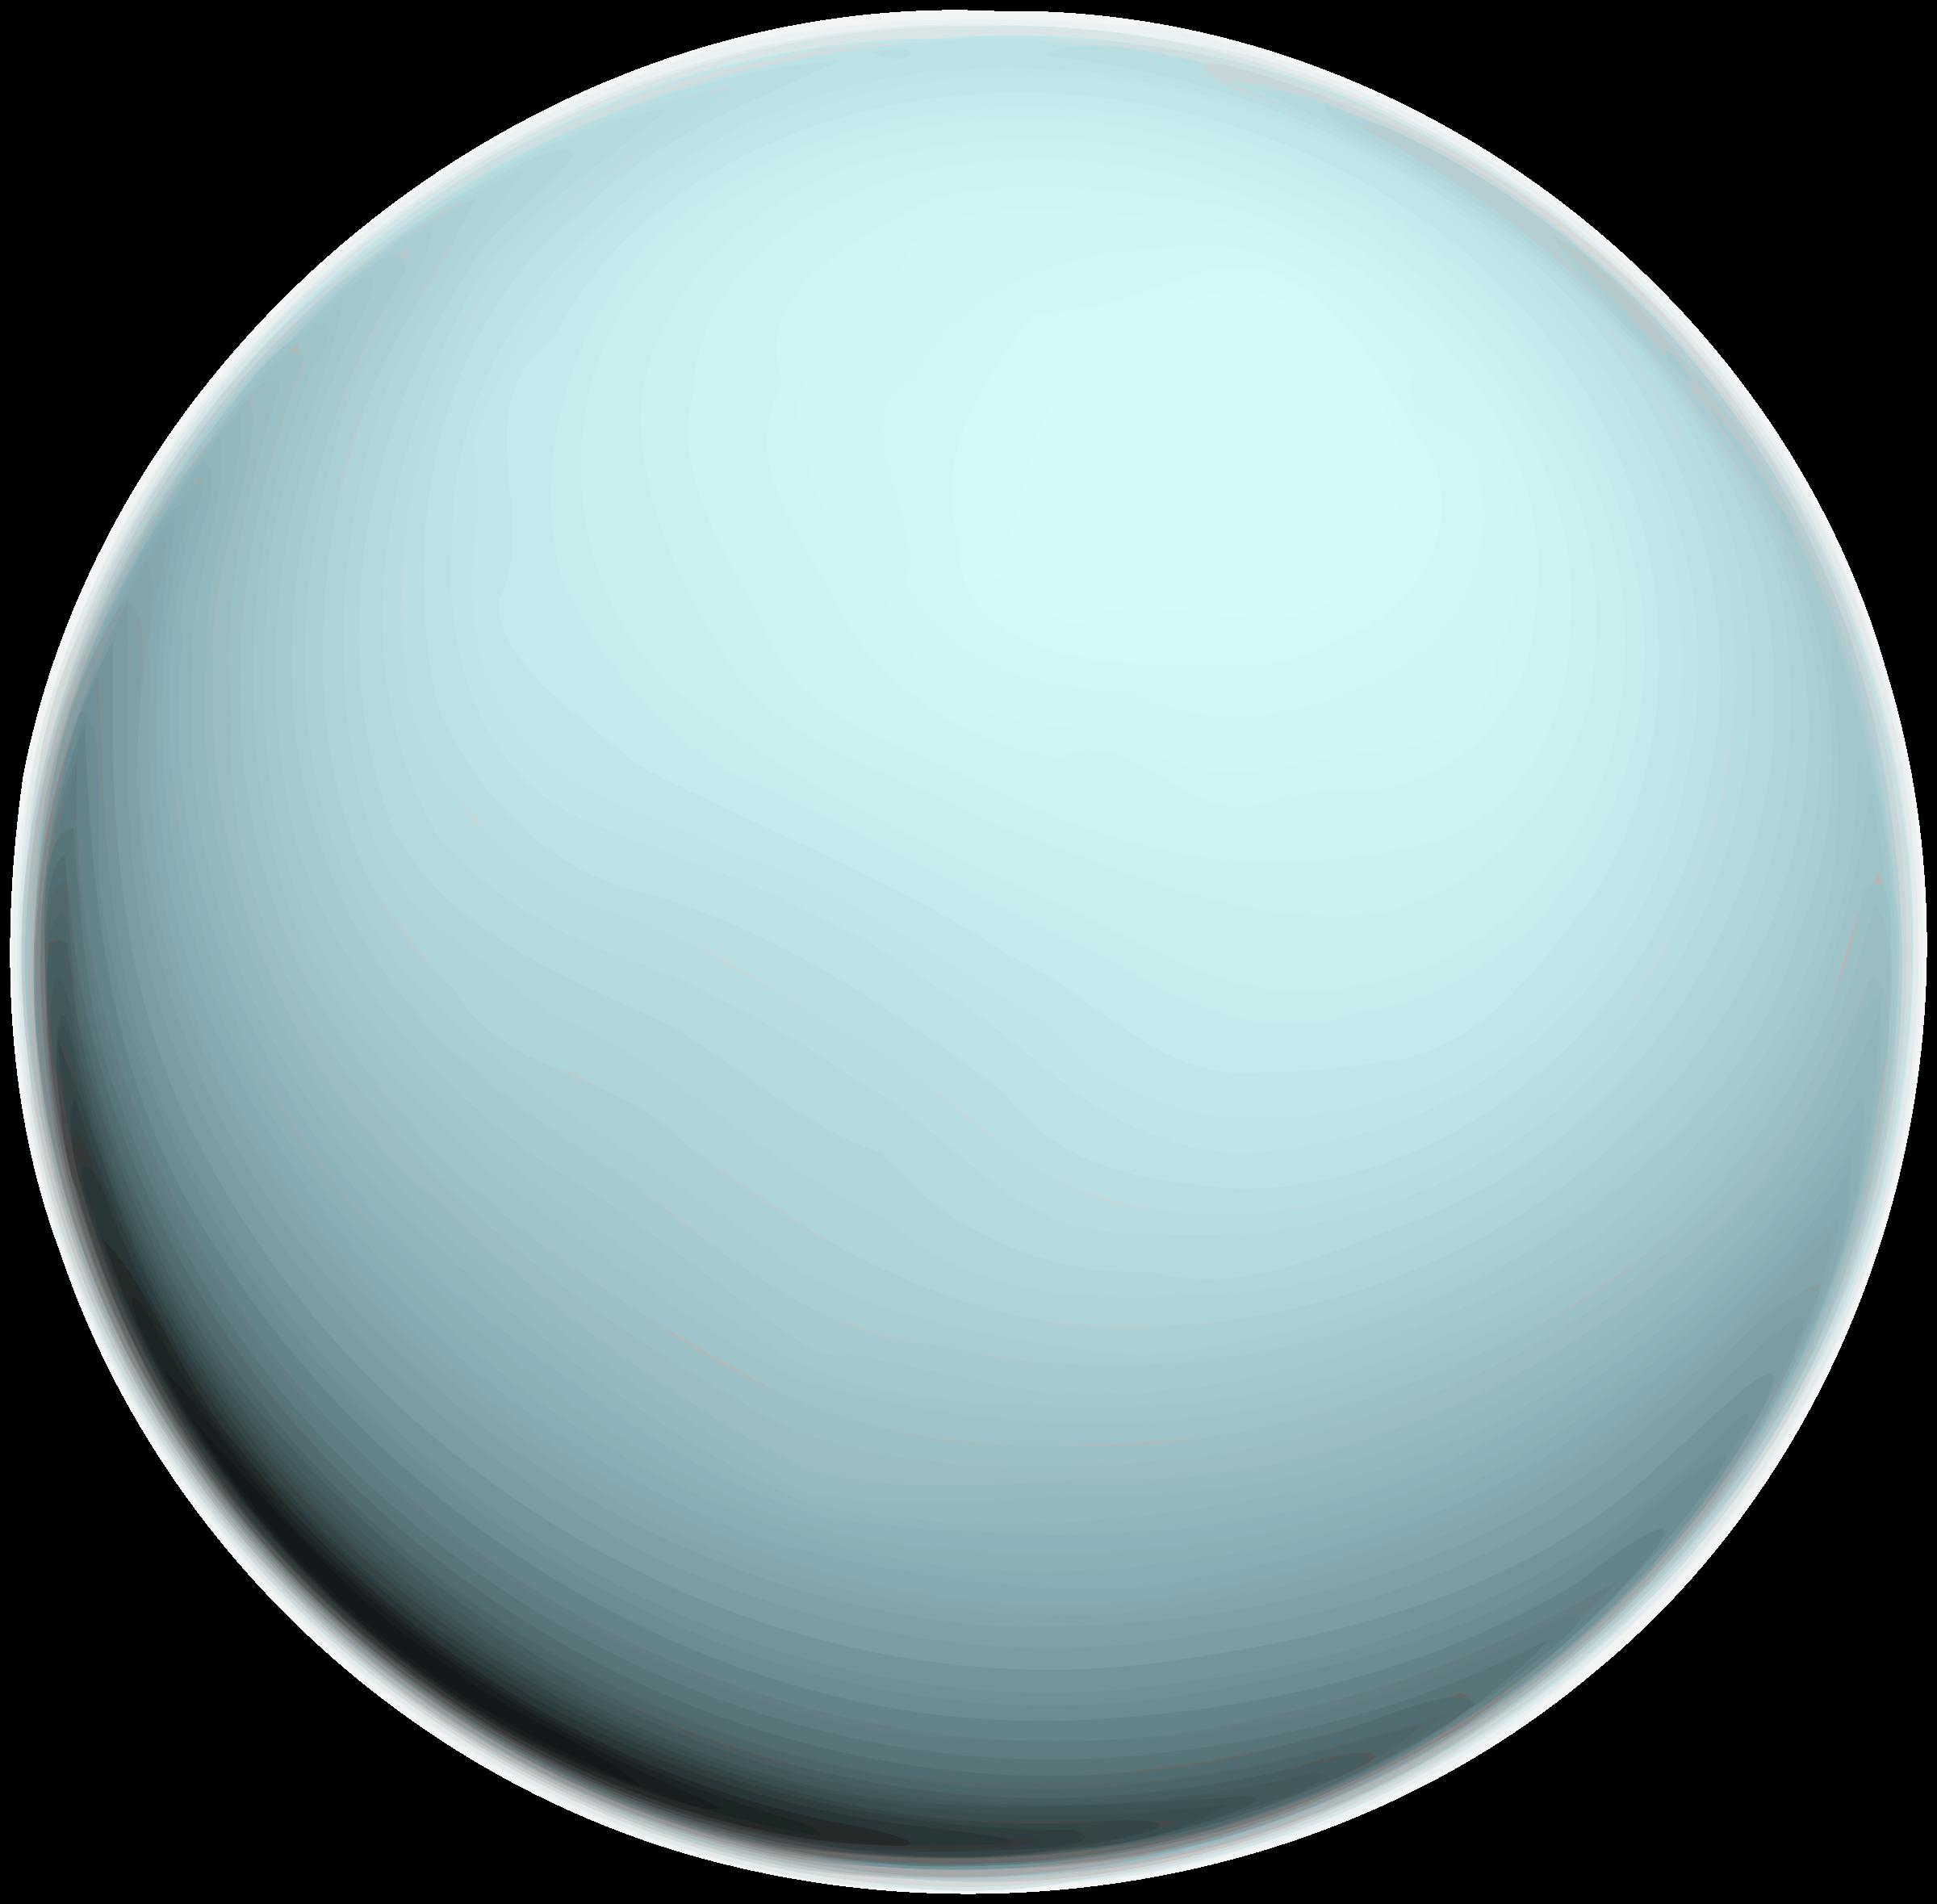 Uranus PNG Clip Art. BIG IMAGE (PNG)-Uranus PNG Clip Art. BIG IMAGE (PNG)-7